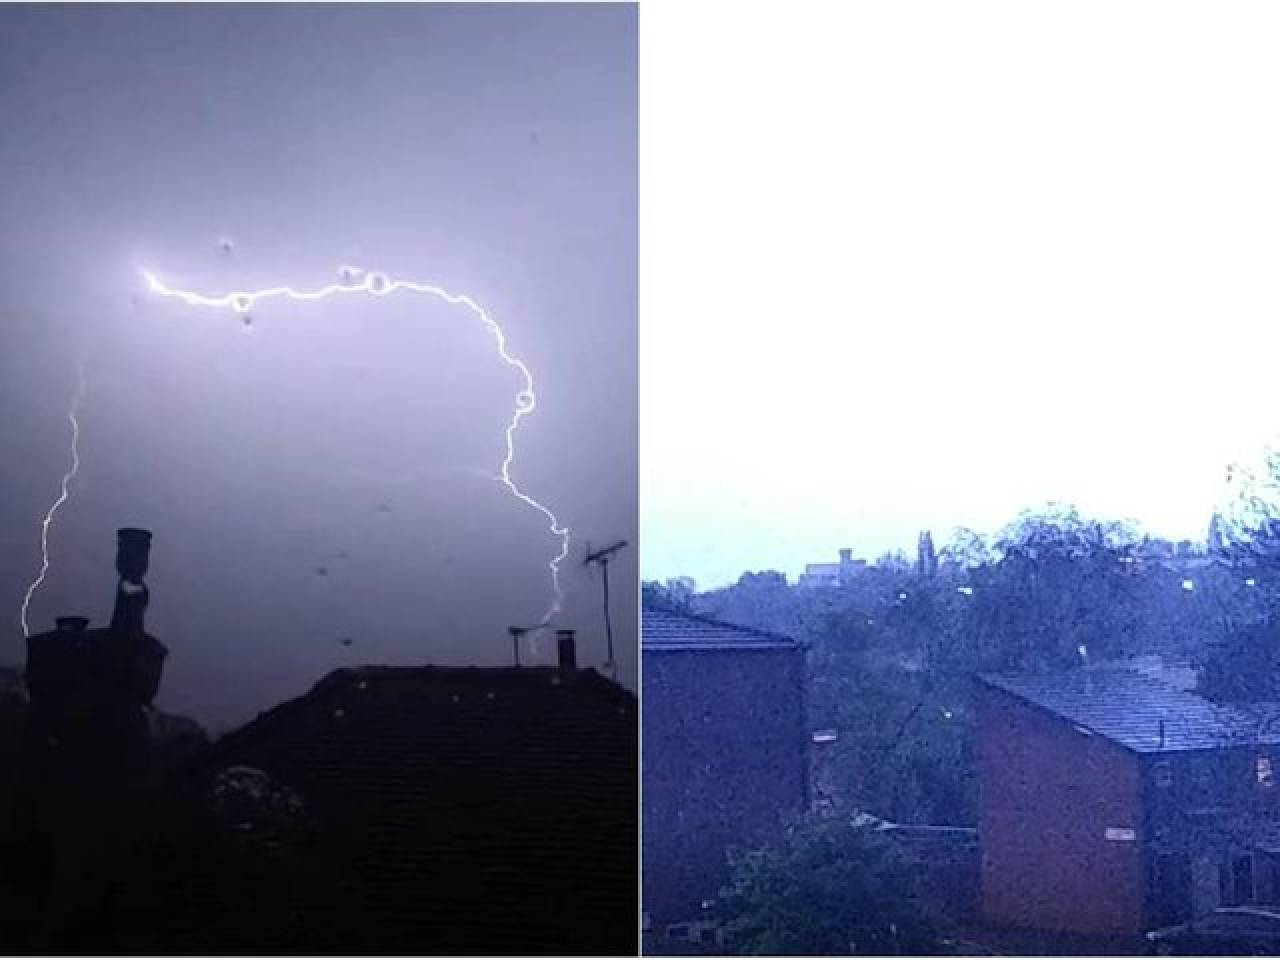 Tempesta di fulmini illumina la notte a Leeds (Fonte: yorkshireeveningpost)